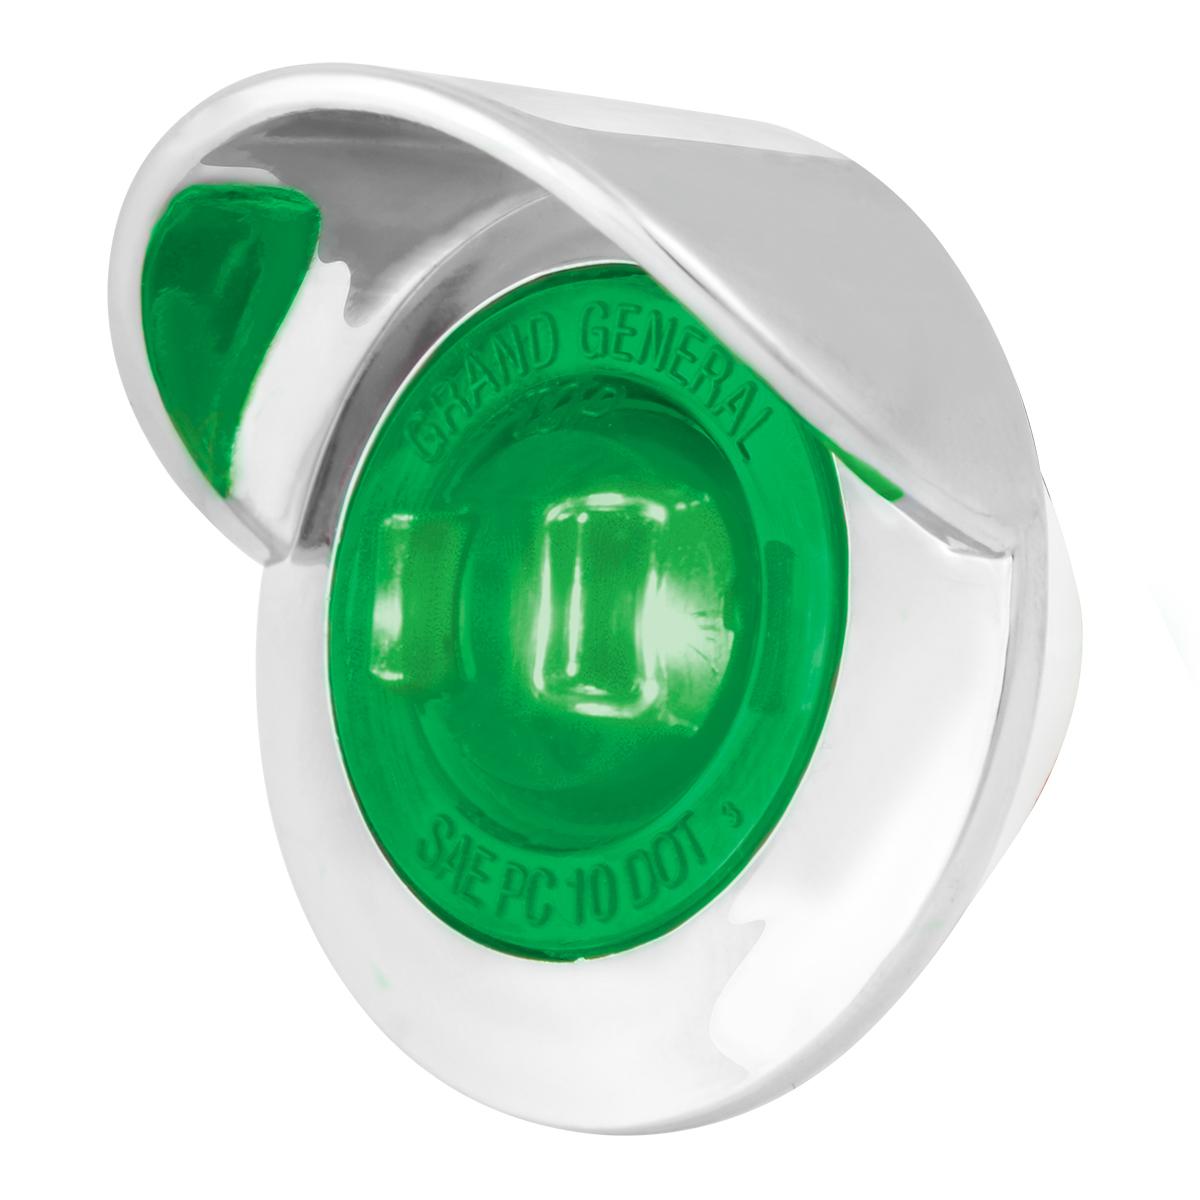 "75266 1"" Dual Function Mini Push/Screw-in Wide Angle LED Light w/ Chrome Bezel & Visor"